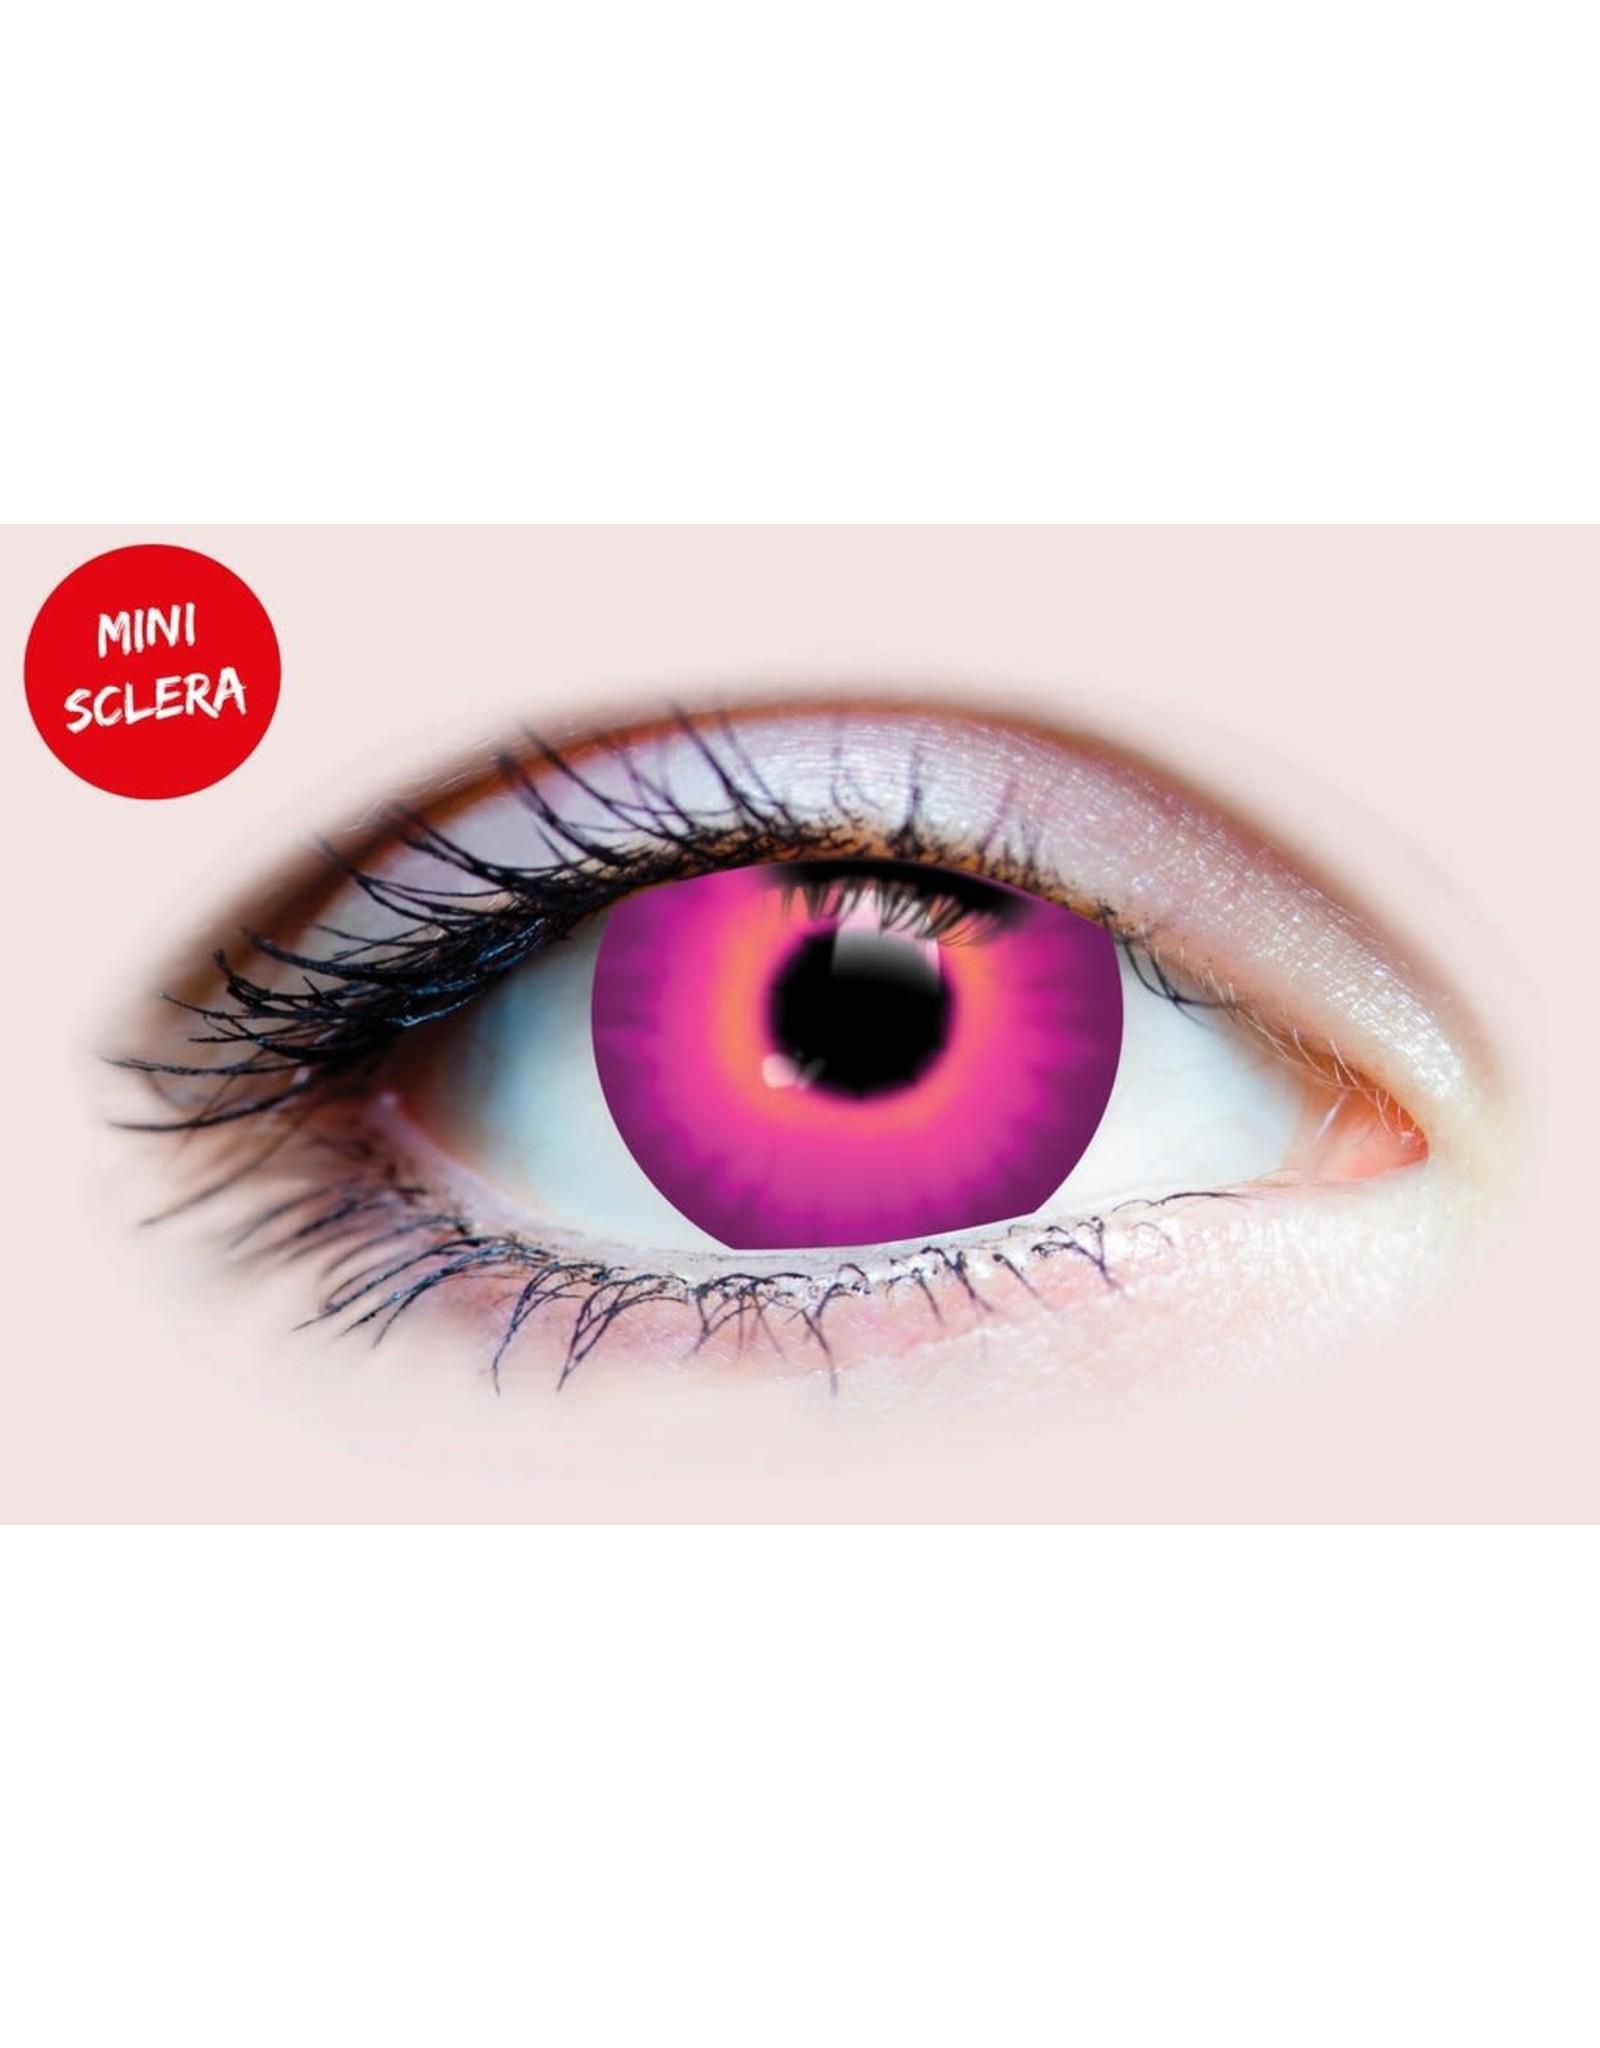 Primal Mini Sclera Contact Lenses - Jinx